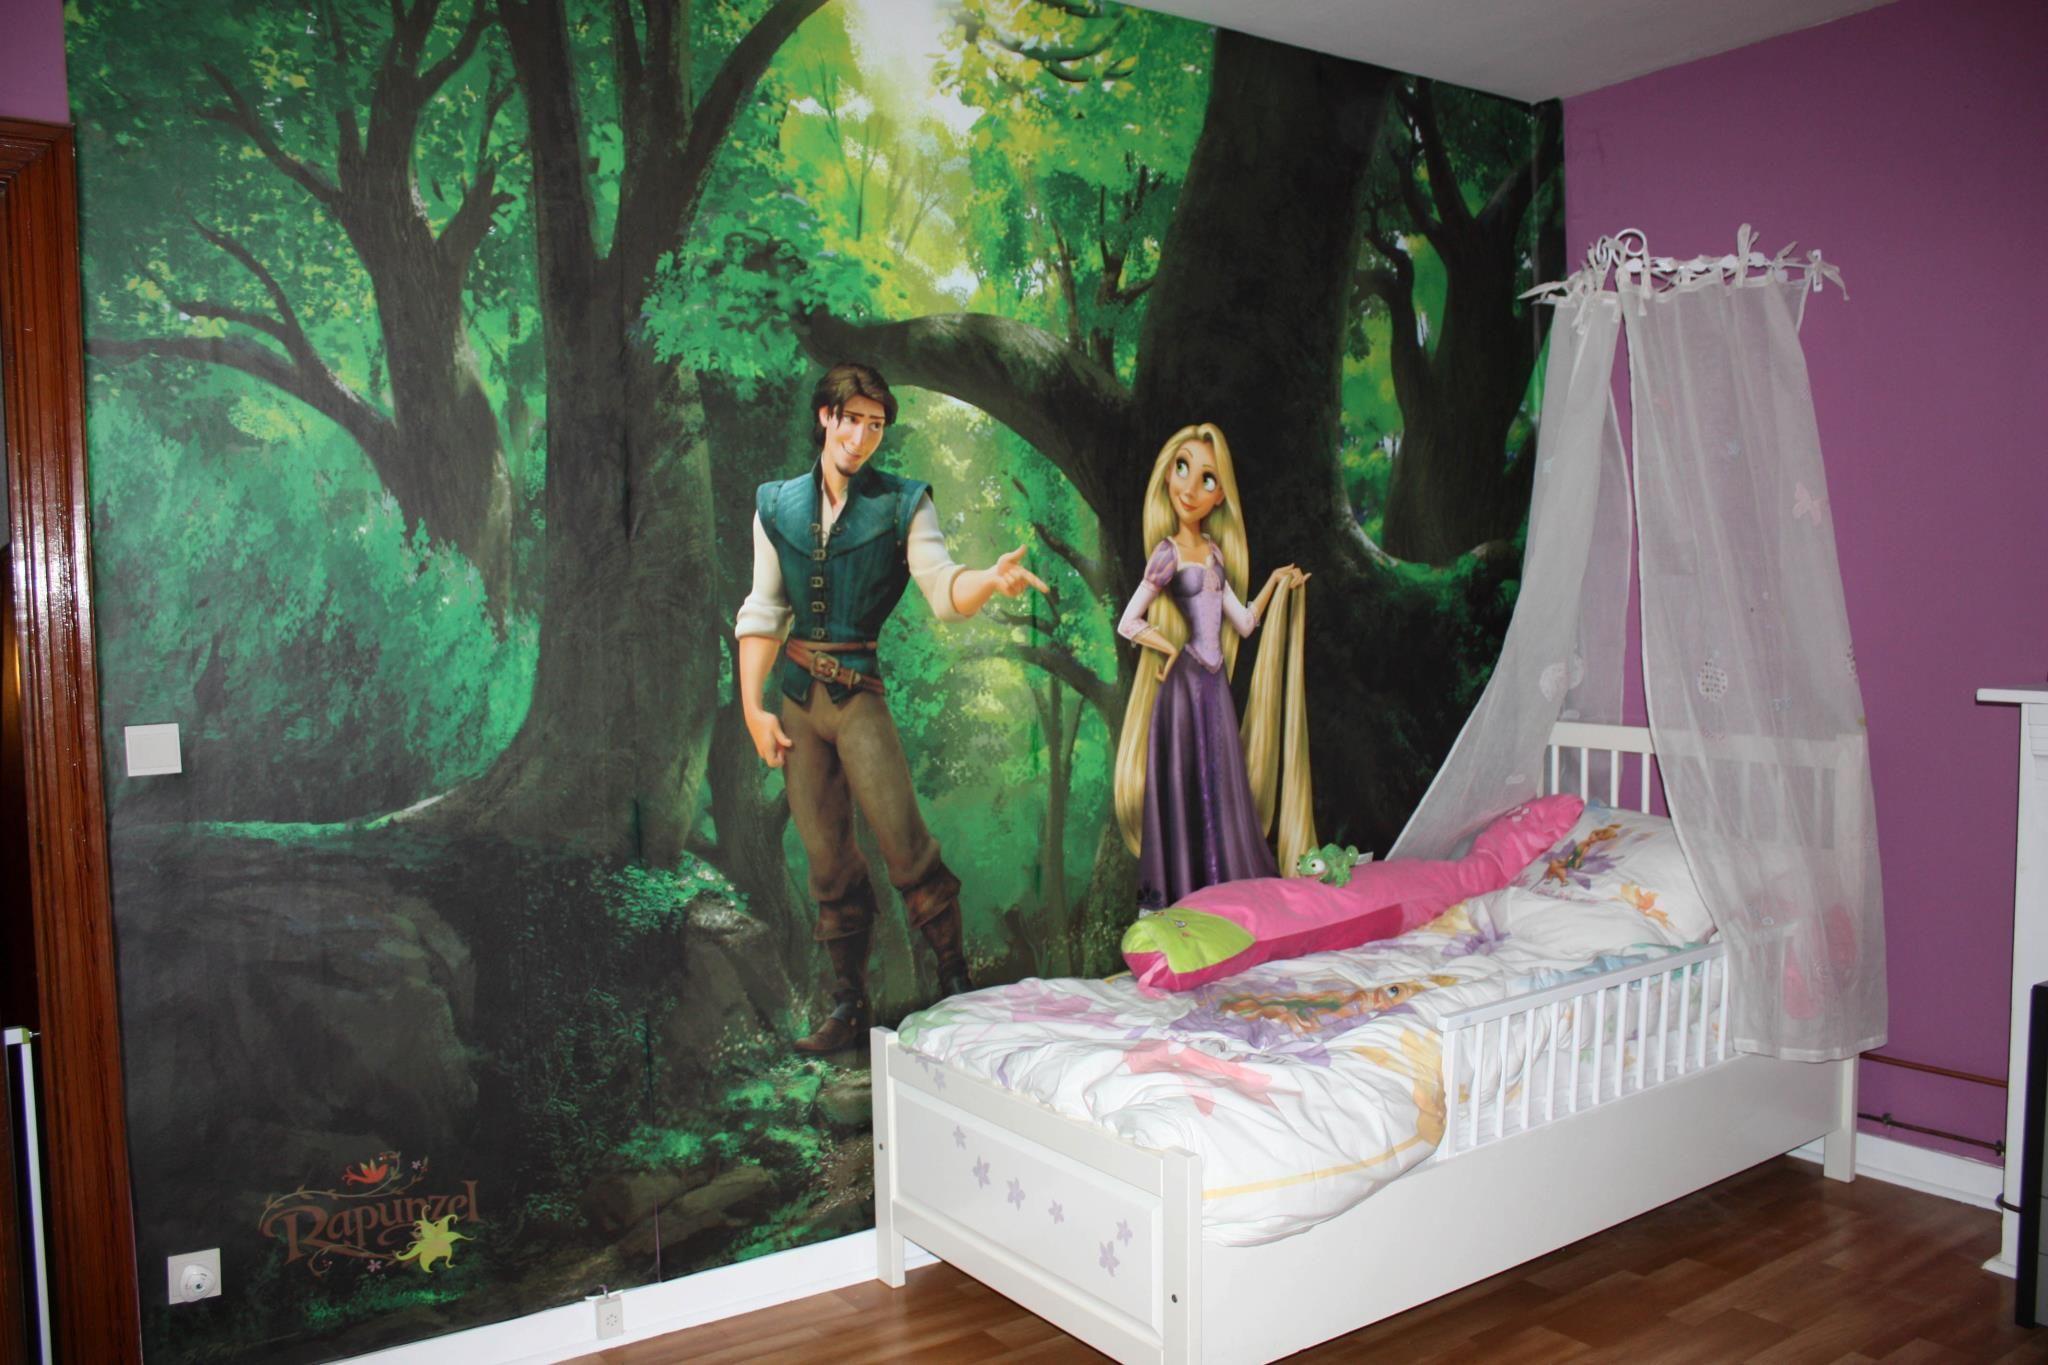 Princess disney, Princesses and Disney on Pinterest